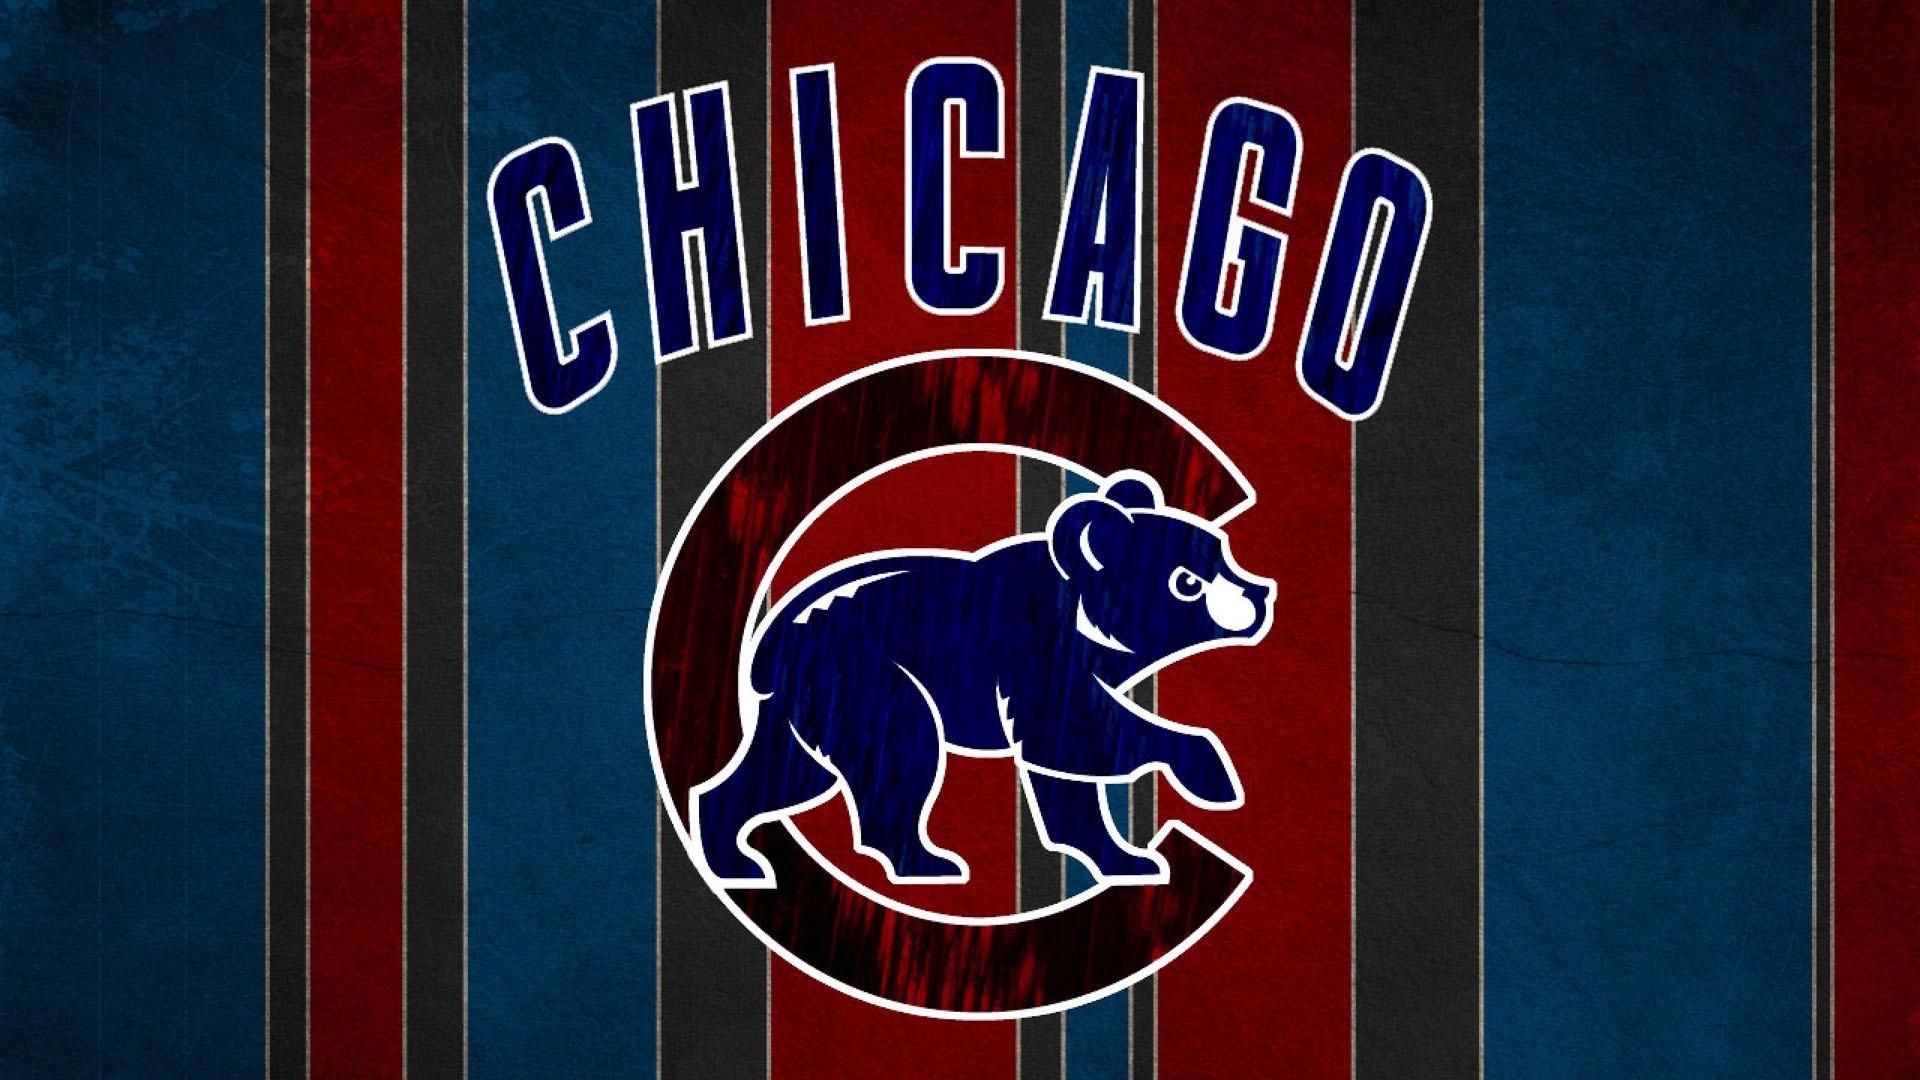 Cubs hd desktop wallpaper